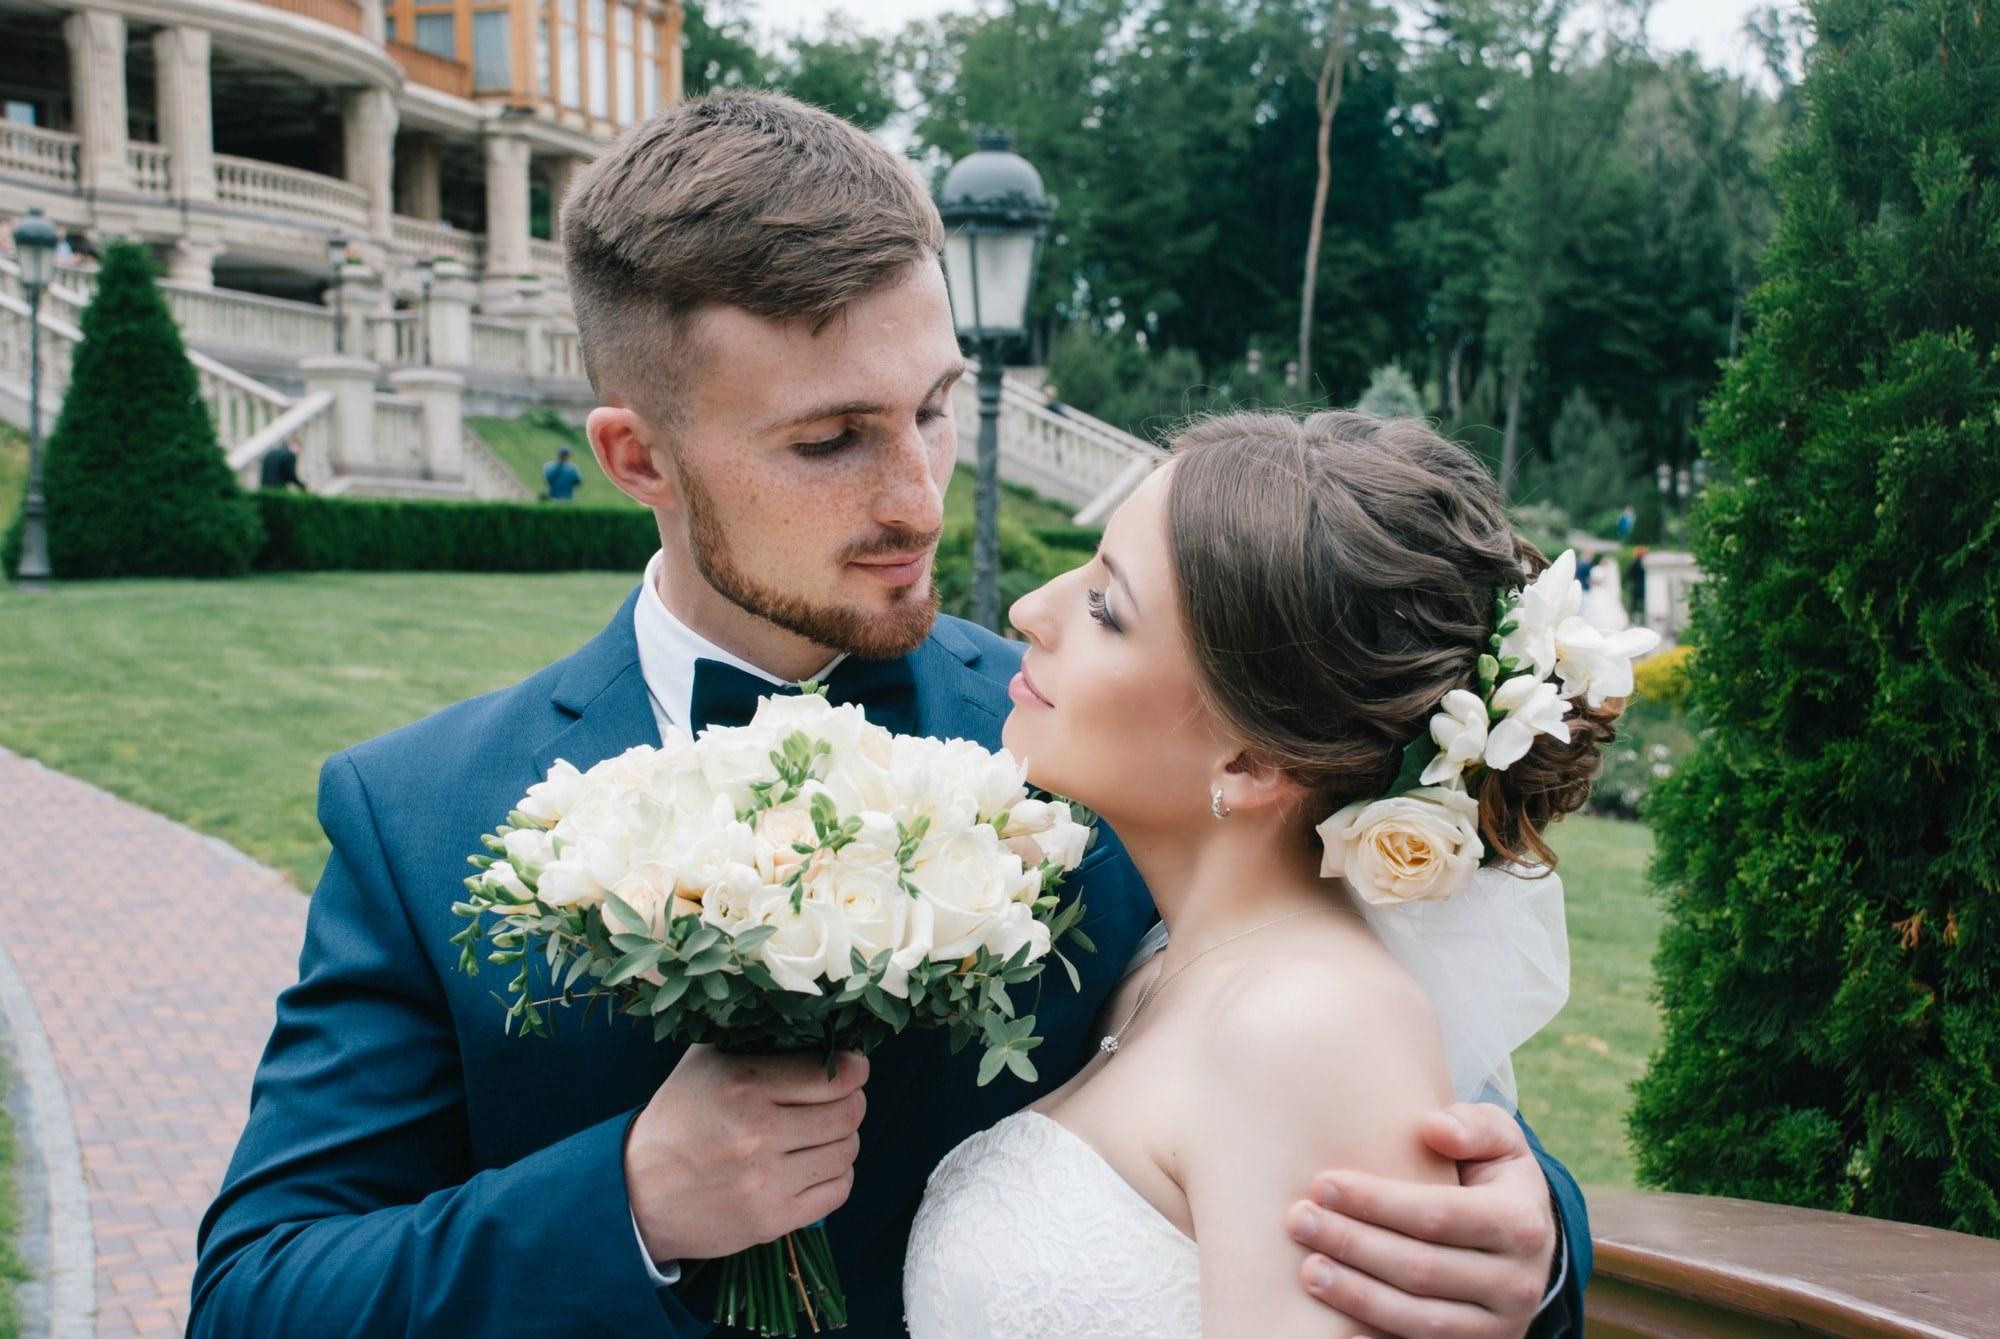 Жених дарит букет невесте - Фотограф Киев - Женя Лайт